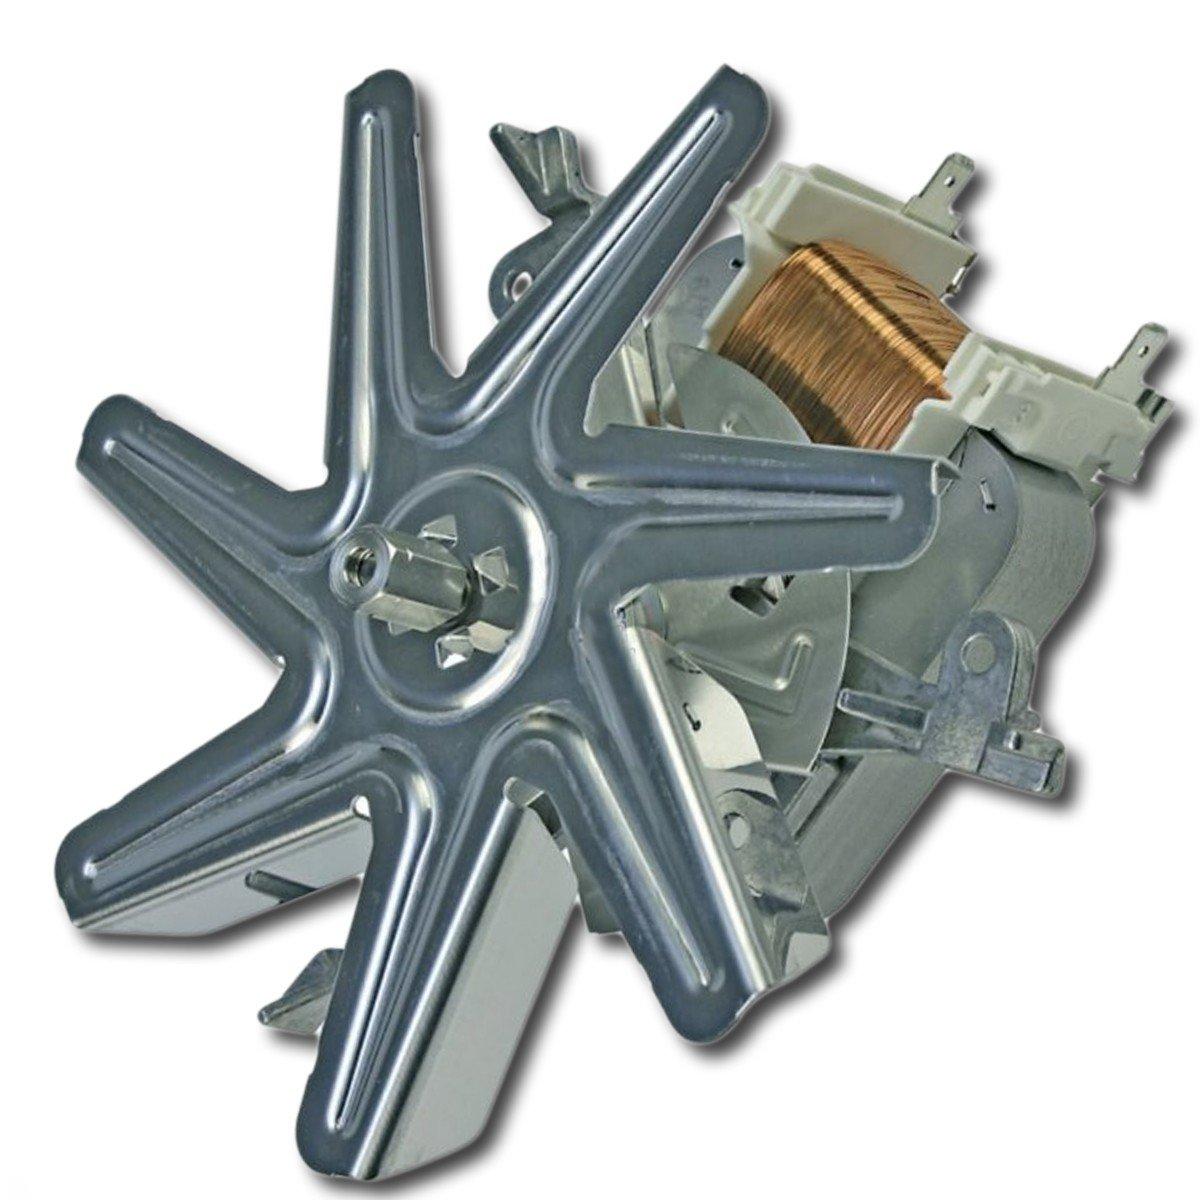 Lü fter Komplettset (Motor und Blassrosa) –  Backofen, Herd –  Bosch, Gaggenau, Neff, Siemens, Constructa, Junker SOS ACCESSOIRE